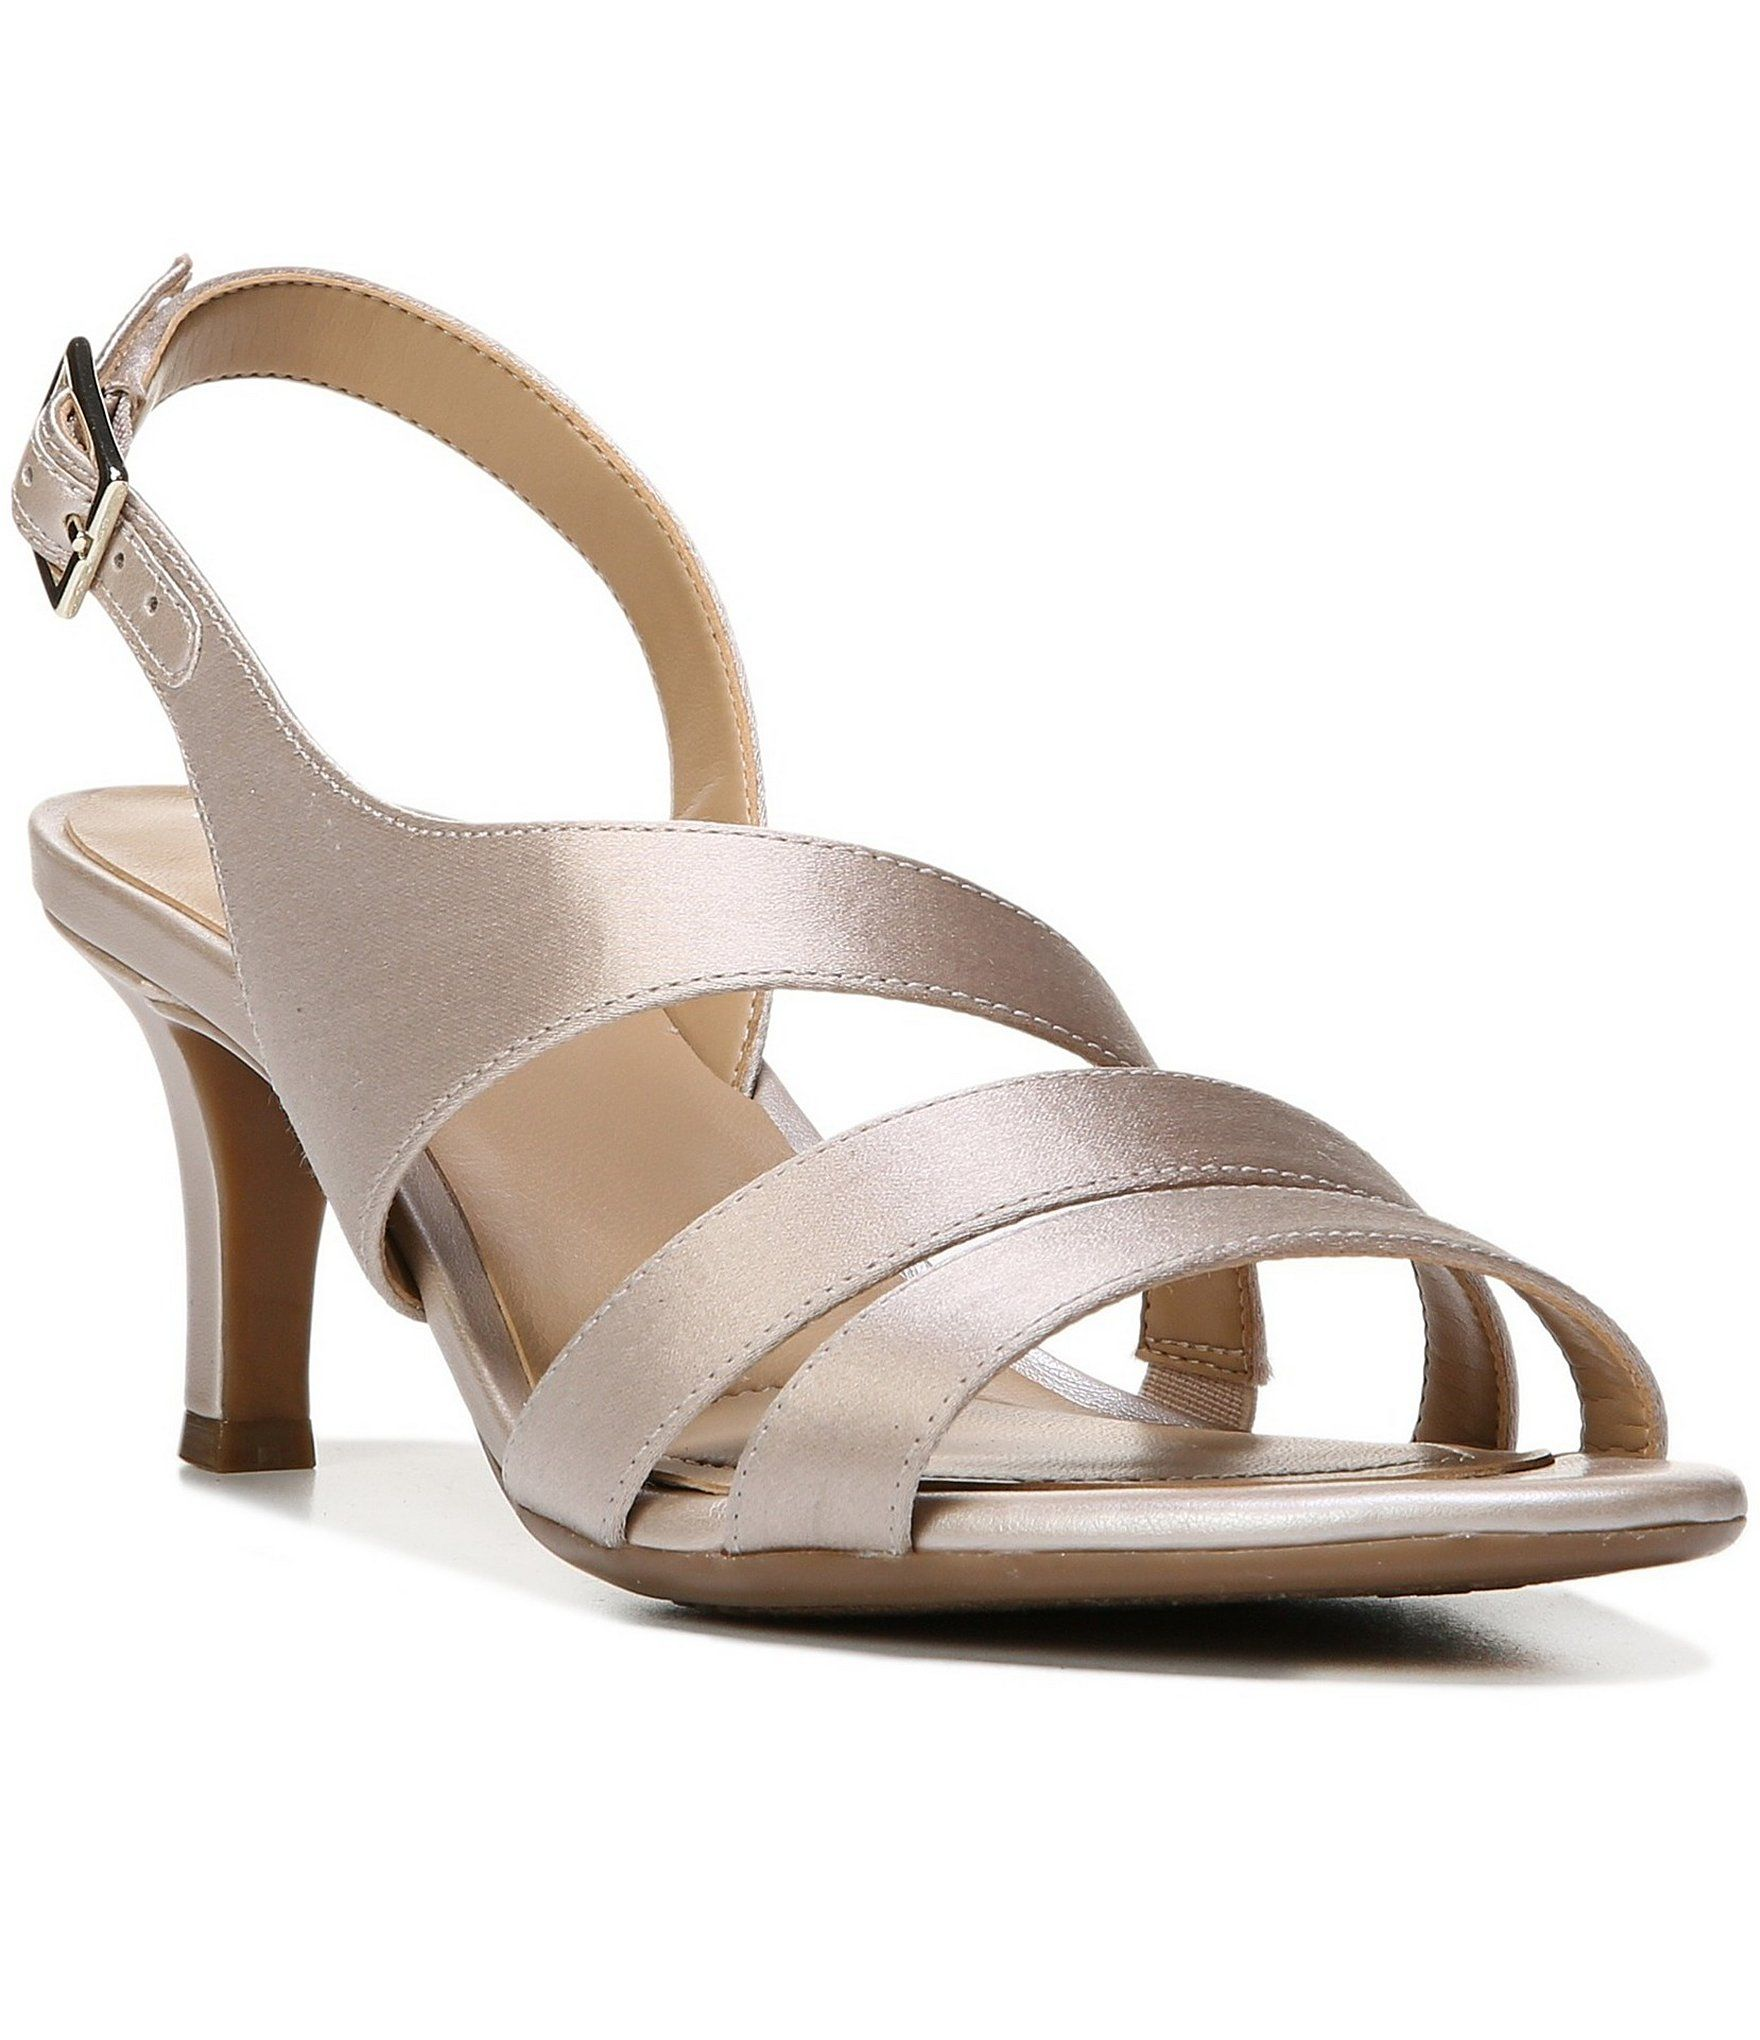 e025c2360dbf Shop for Naturalizer Taimi Metallic Fabric Slingback Dress Sandals at  Dillards.com. Visit Dillards.com to find clothing